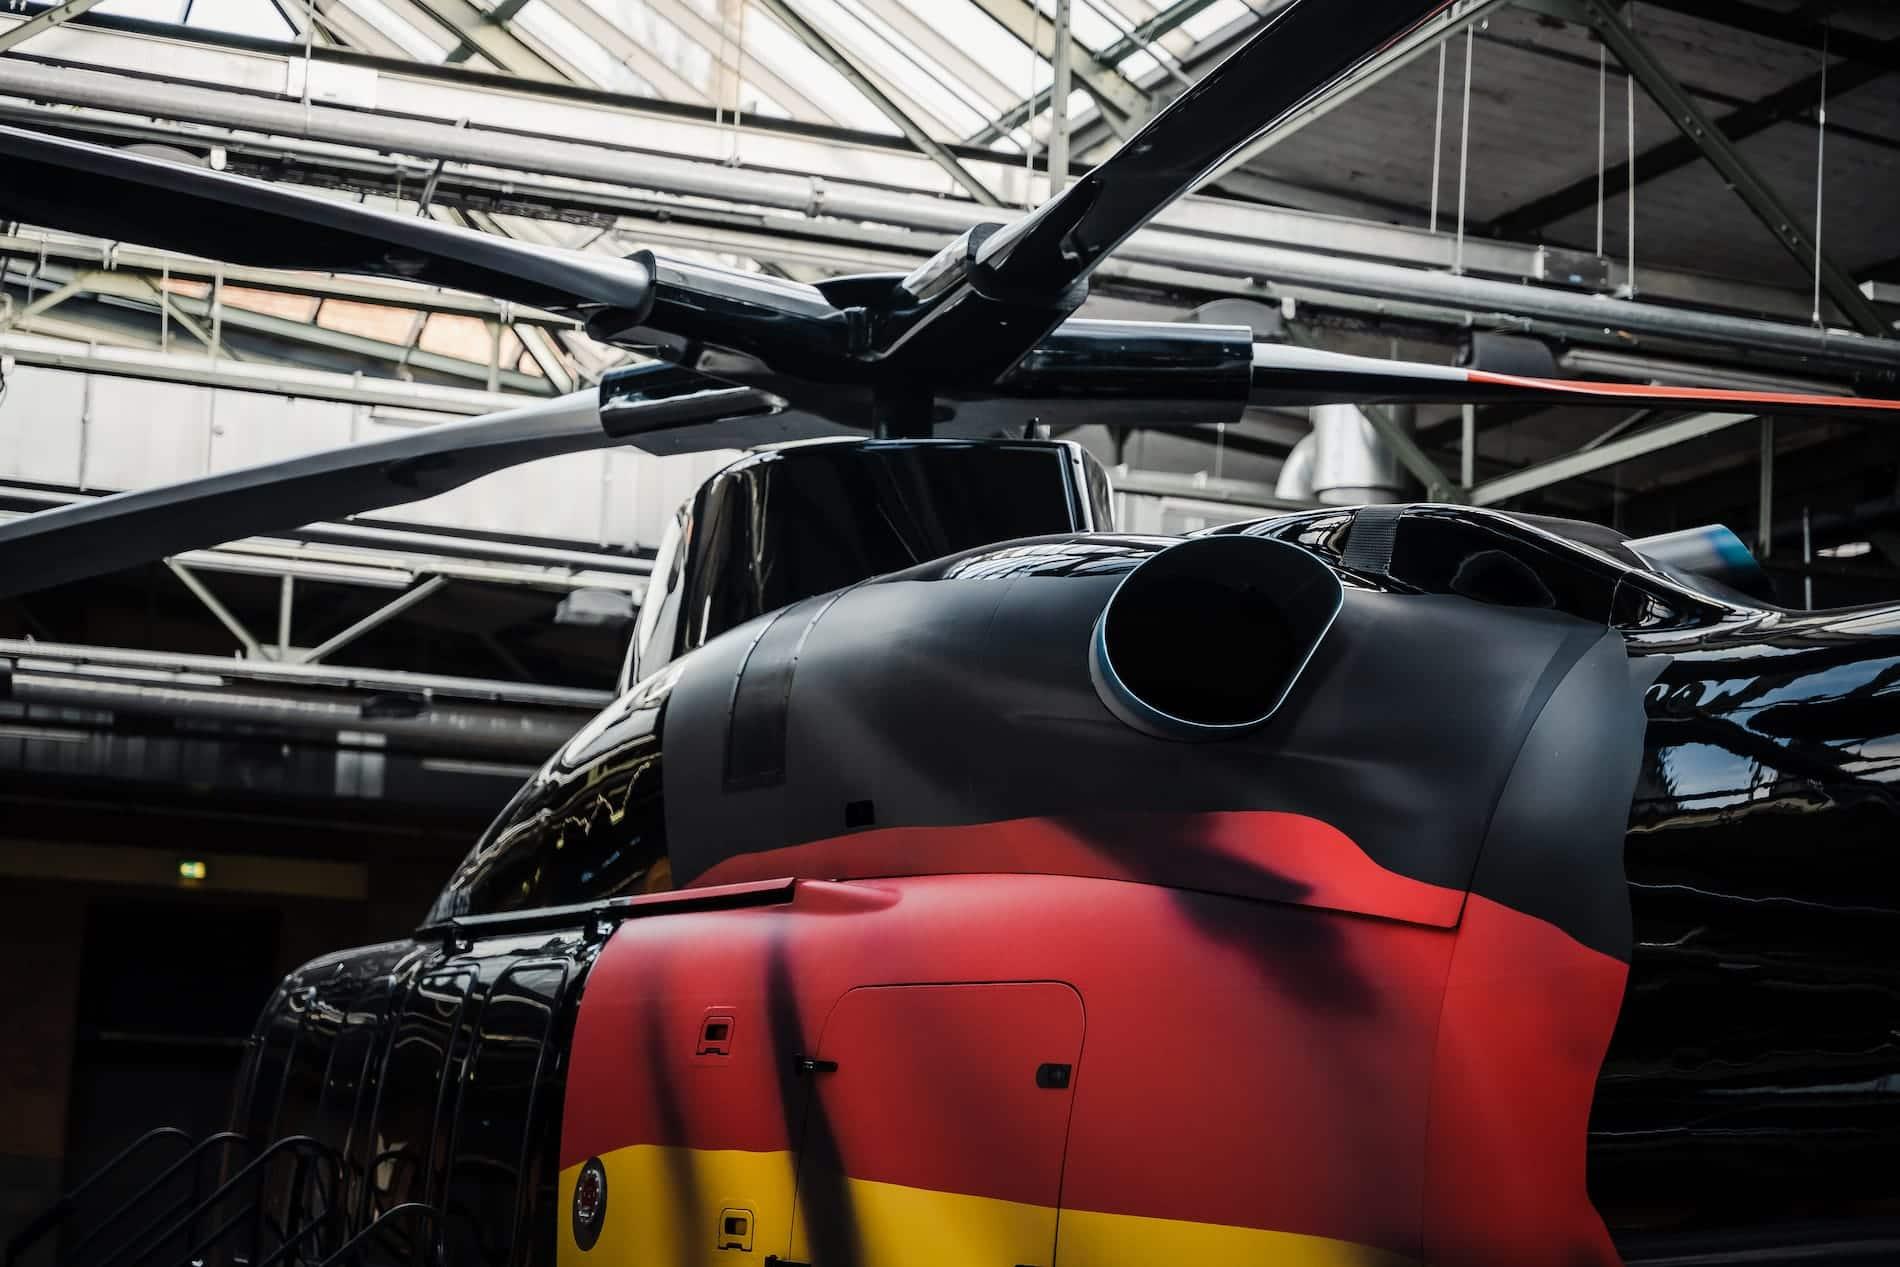 BELL_525_Germany-17